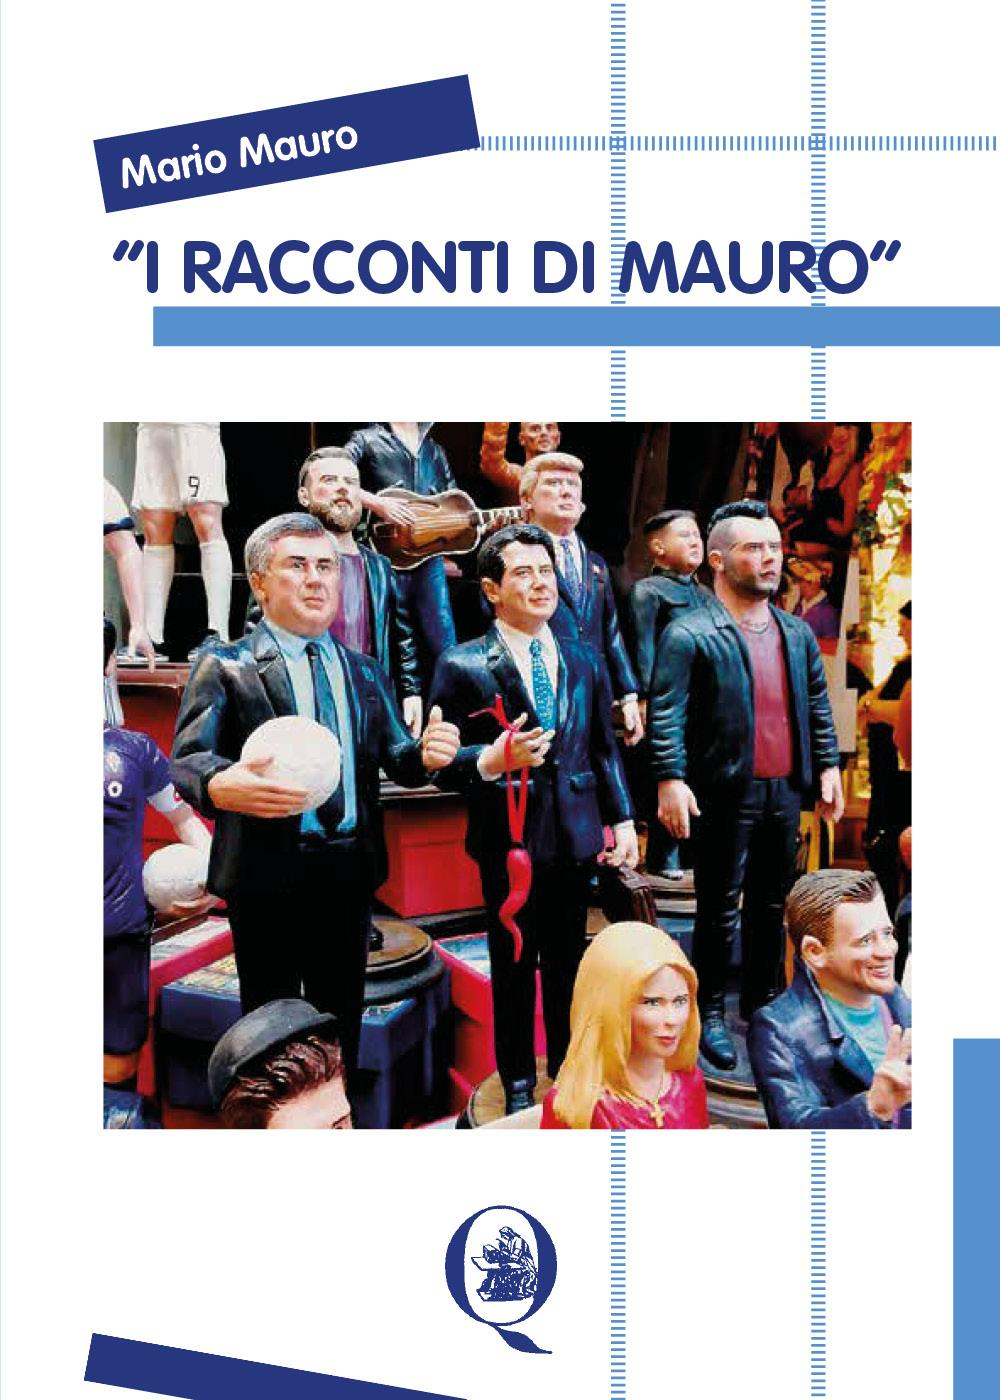 I Racconti di Mauro